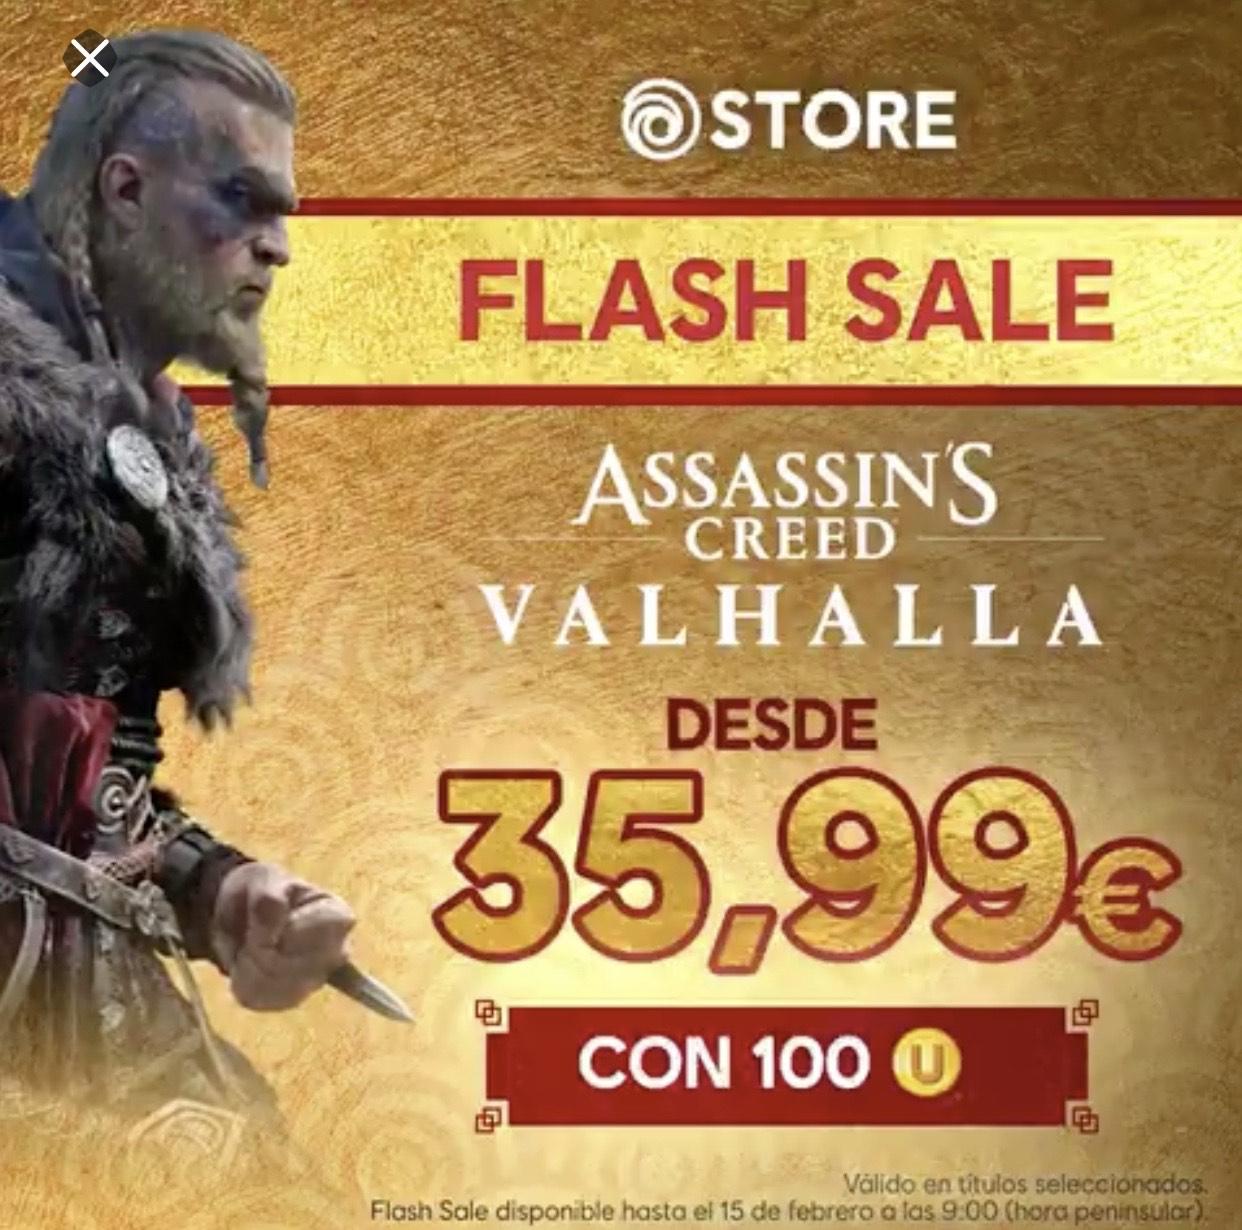 ASSASSIN'S CREED VALHALLA 20% de descuento usando 100 ubi coins